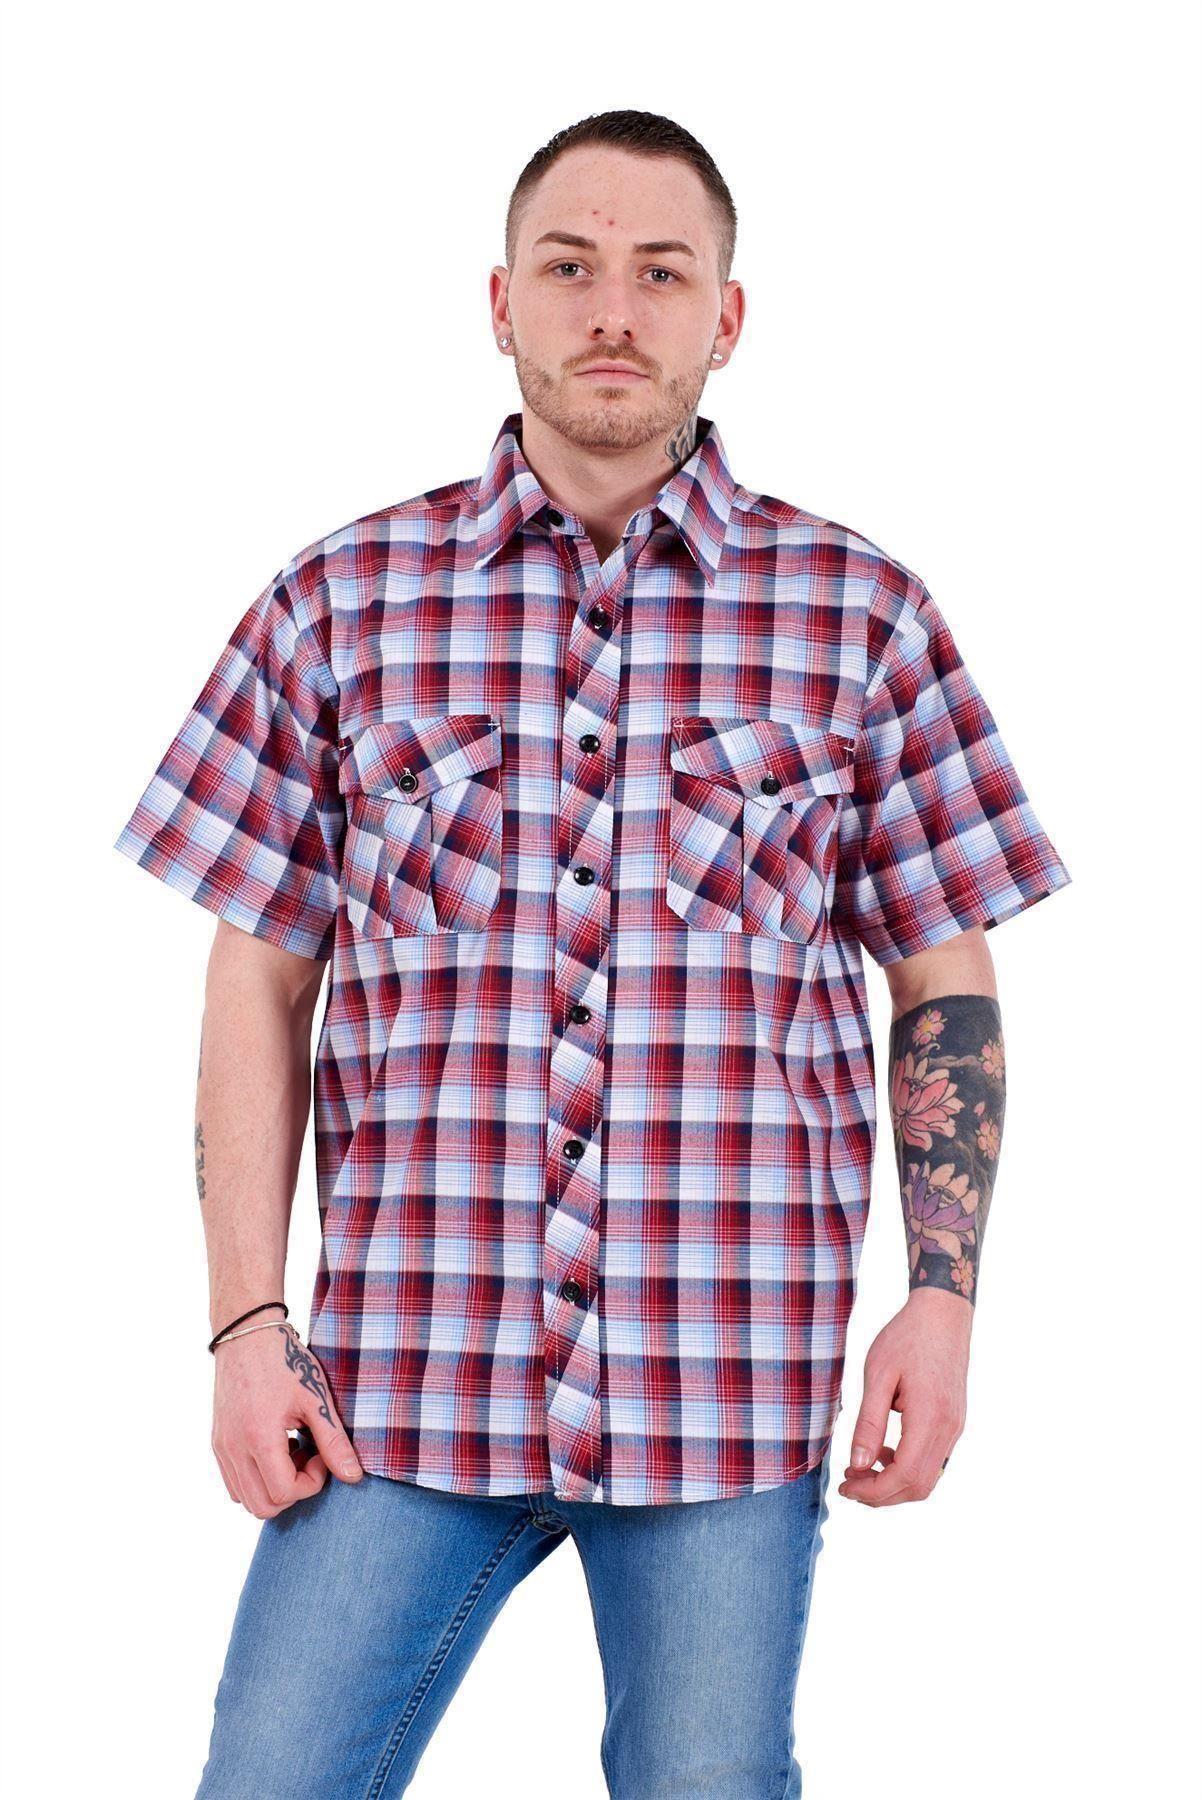 Mens-Regular-Big-Size-Shirts-Checked-Cotton-Blend-Casual-Short-Sleeve-M-to-5XL thumbnail 29